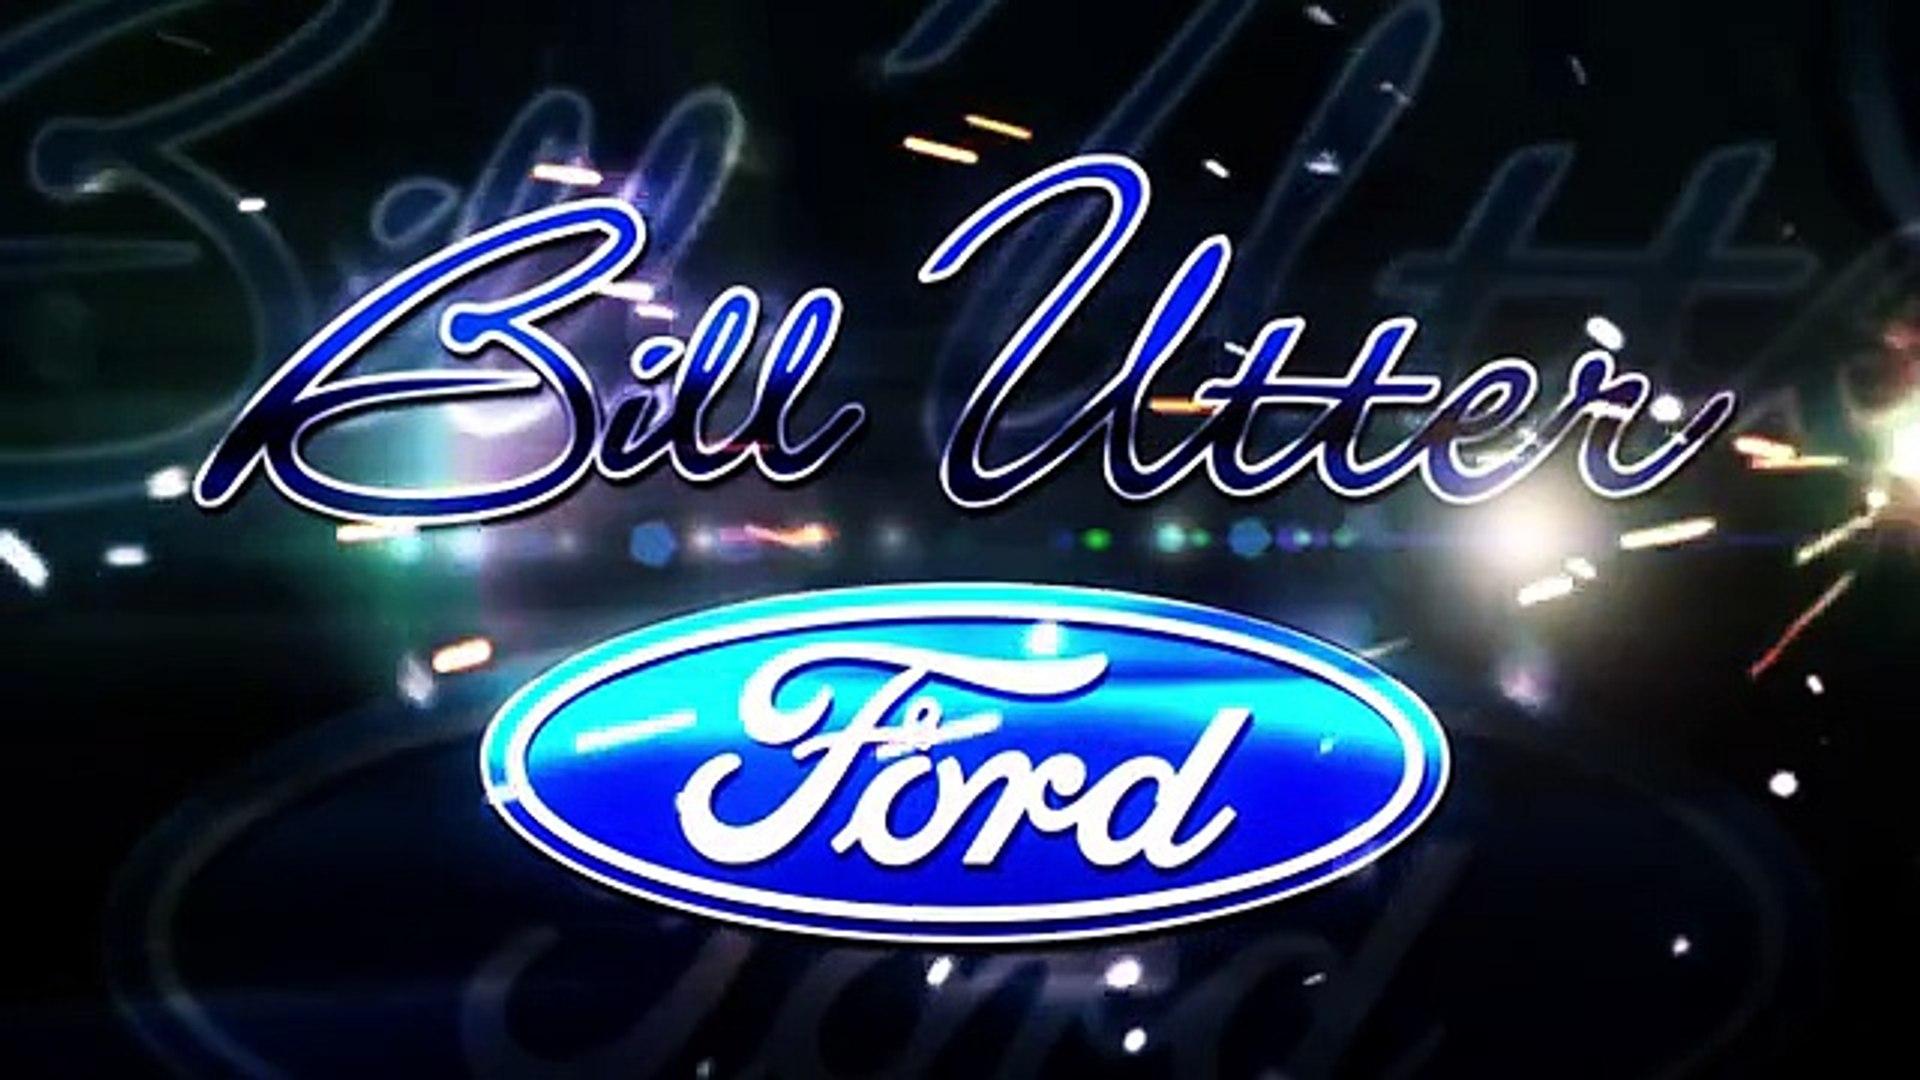 2017 Ford Flex Decatur, TX | Ford Flex Decatur, TX